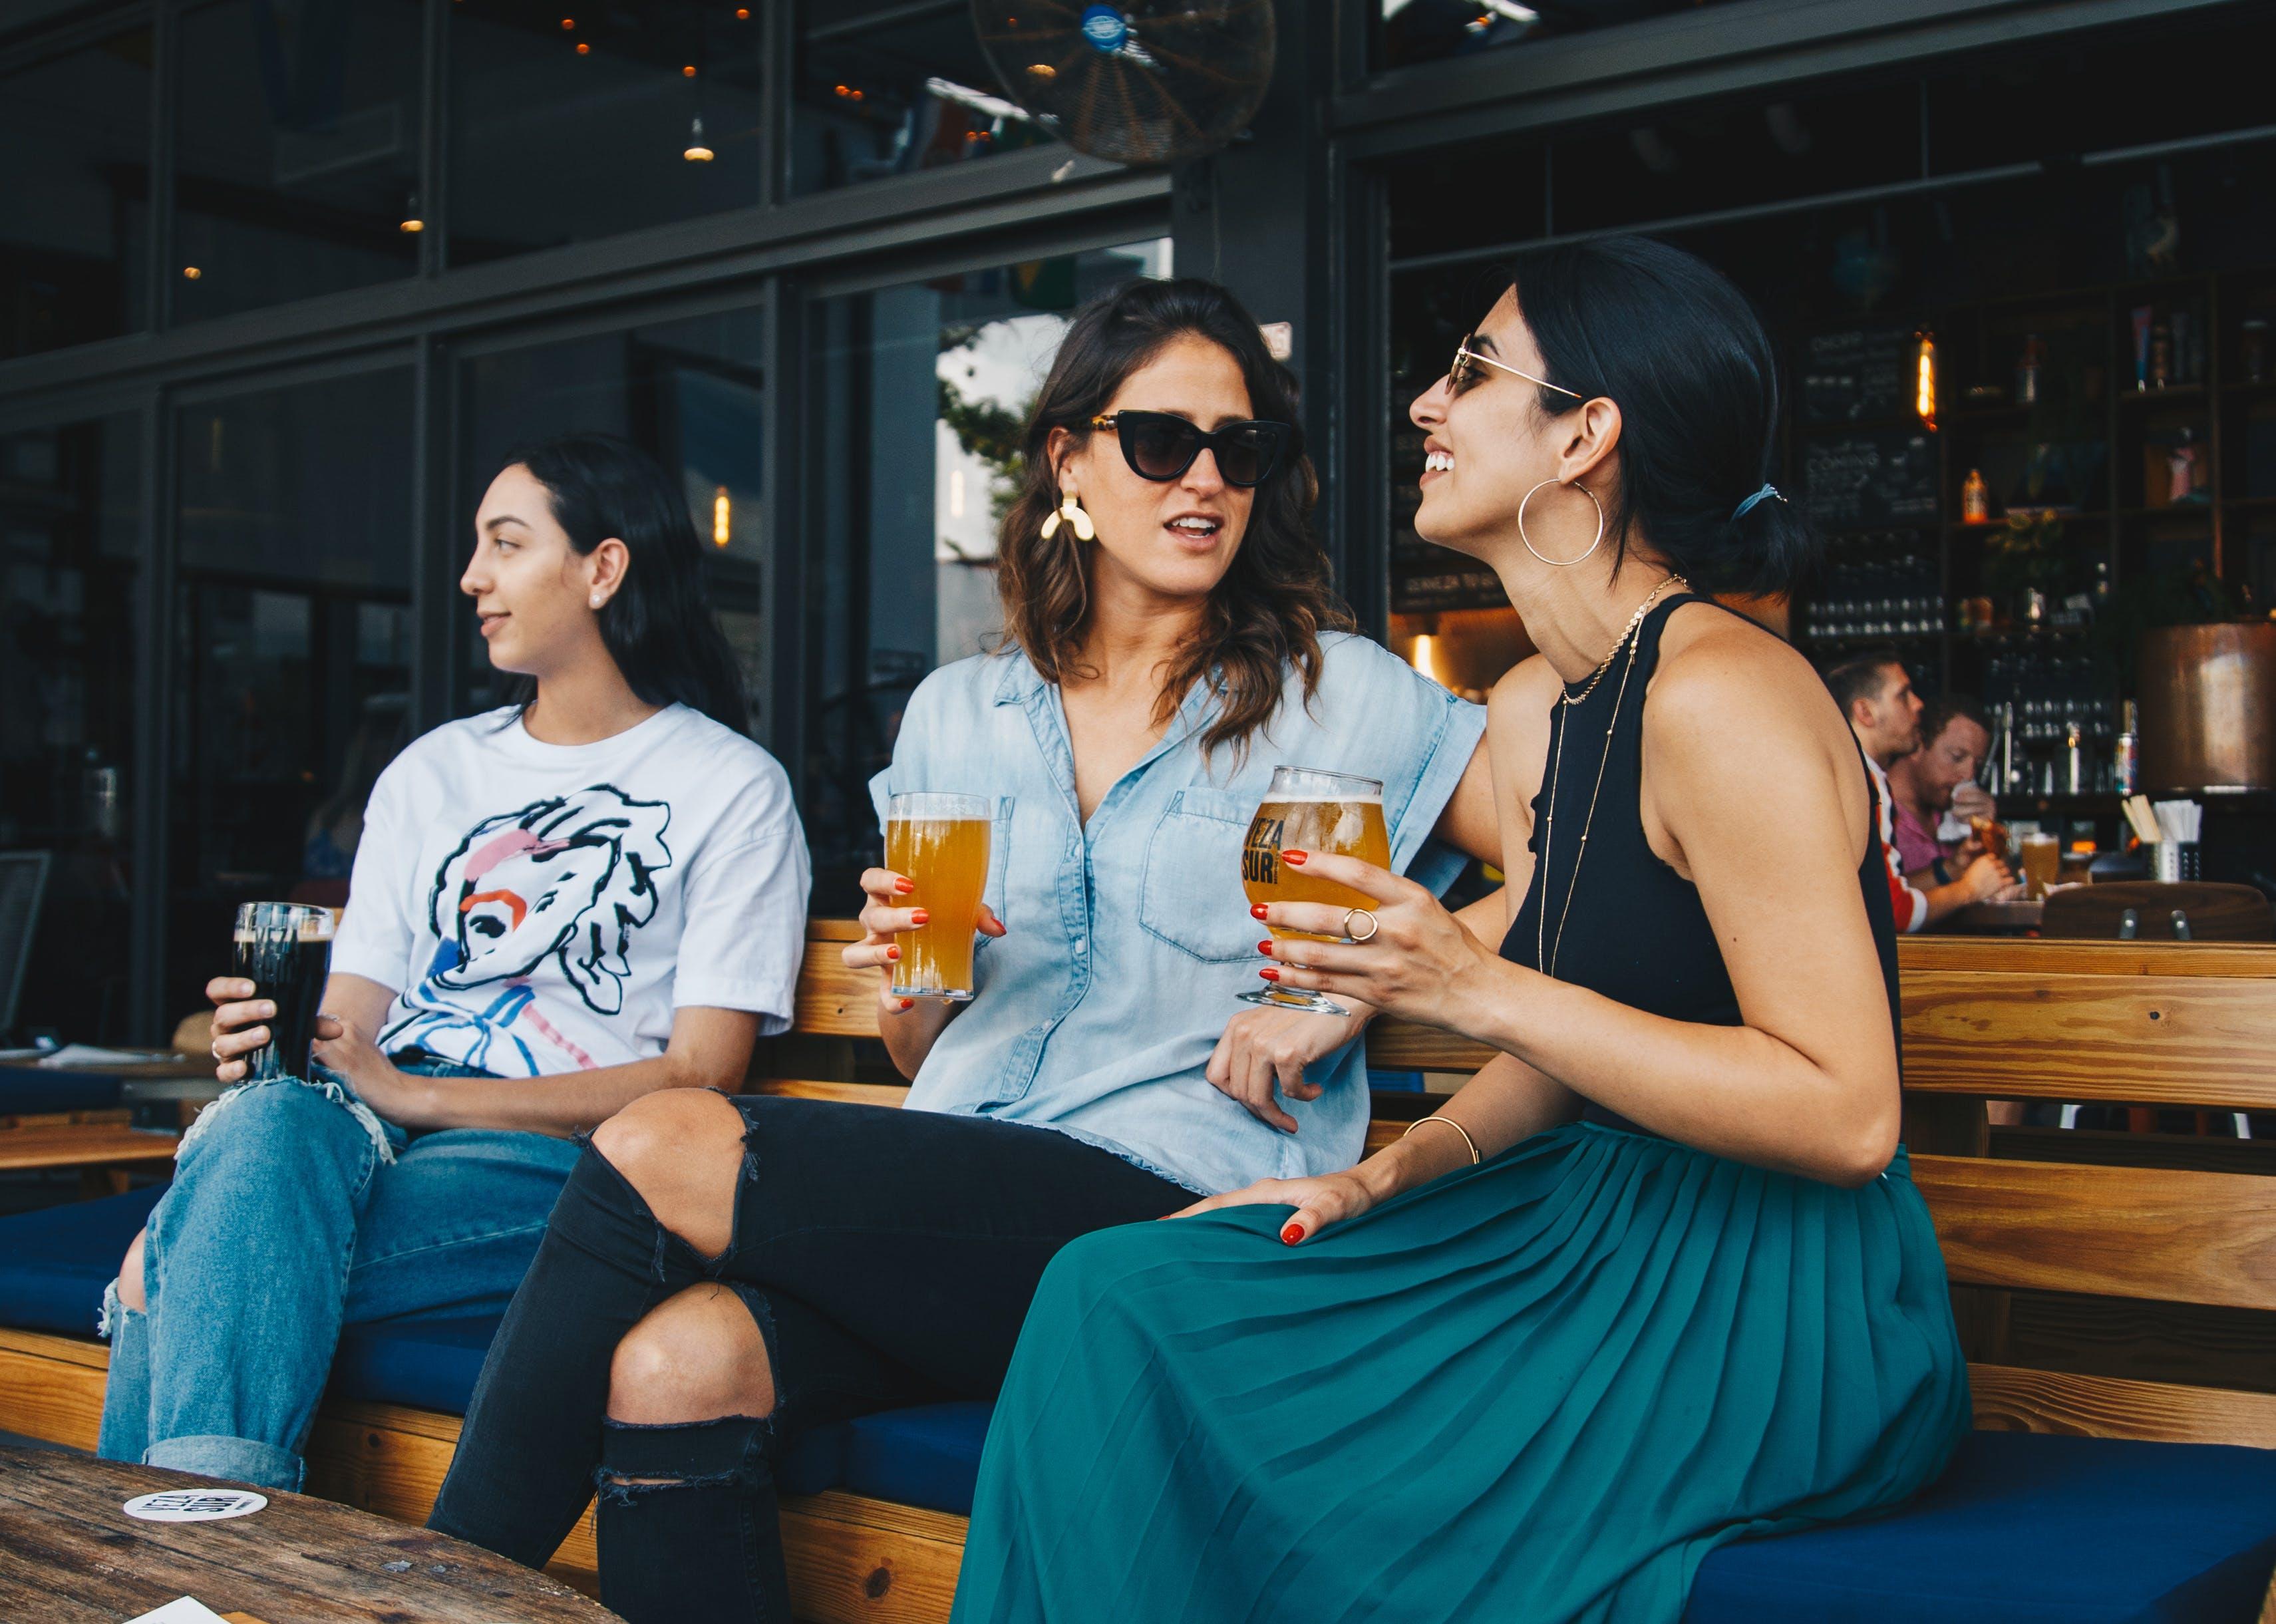 Three Women Holding Drinking Glasses